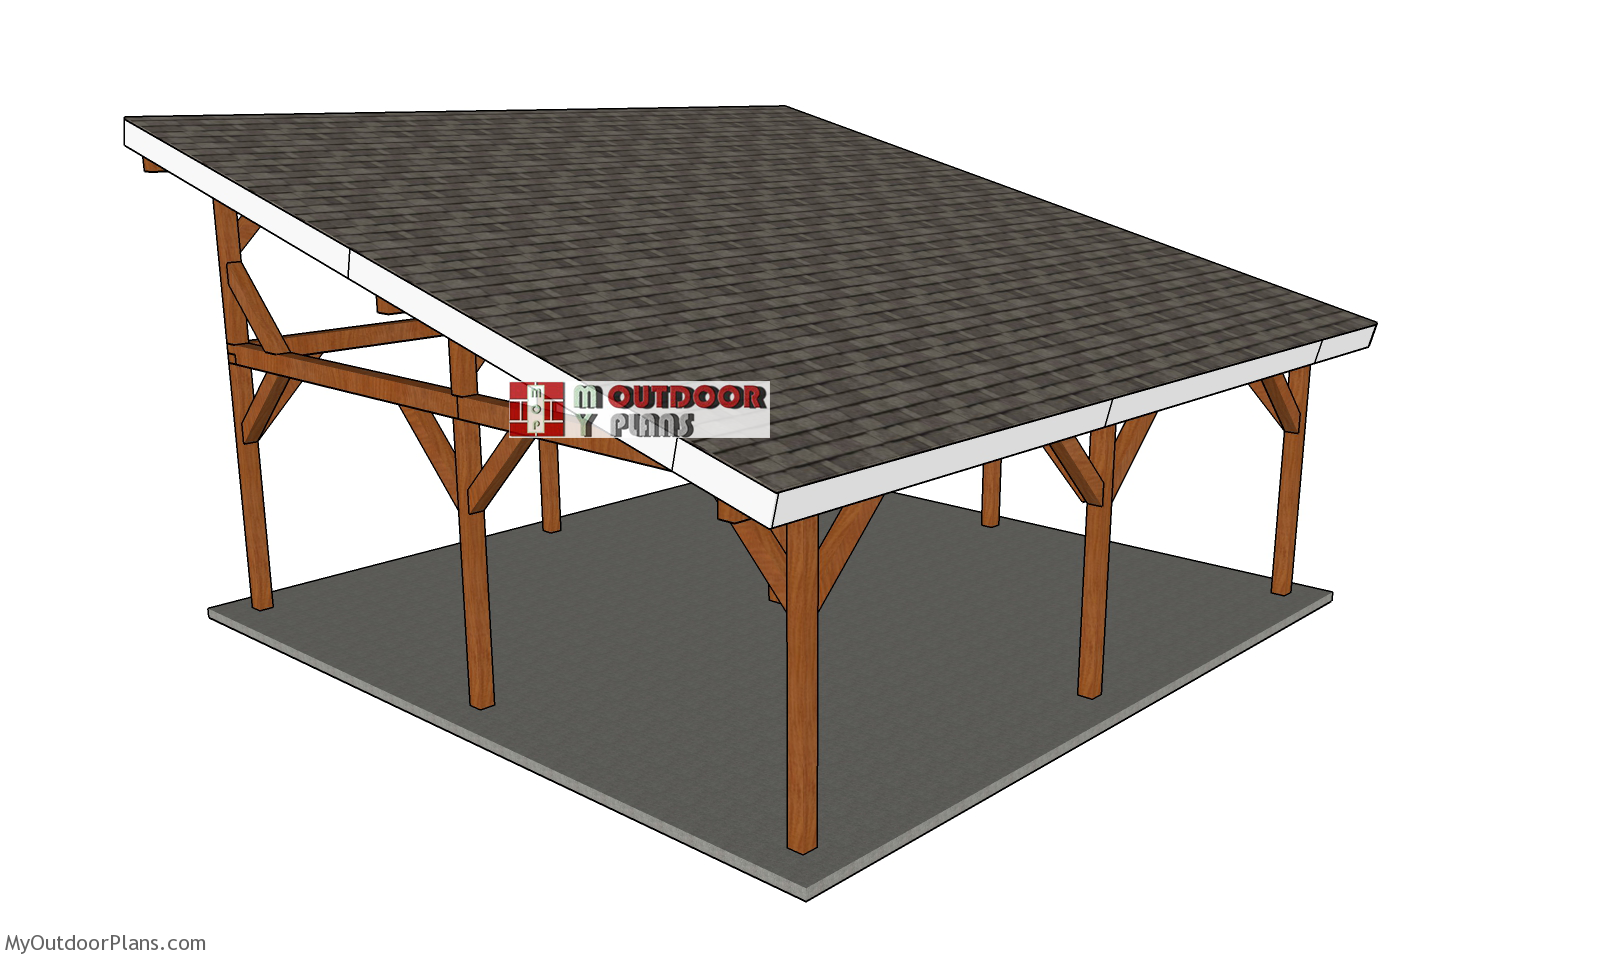 24x24 Lean to Pavilion - Free DIY Plans